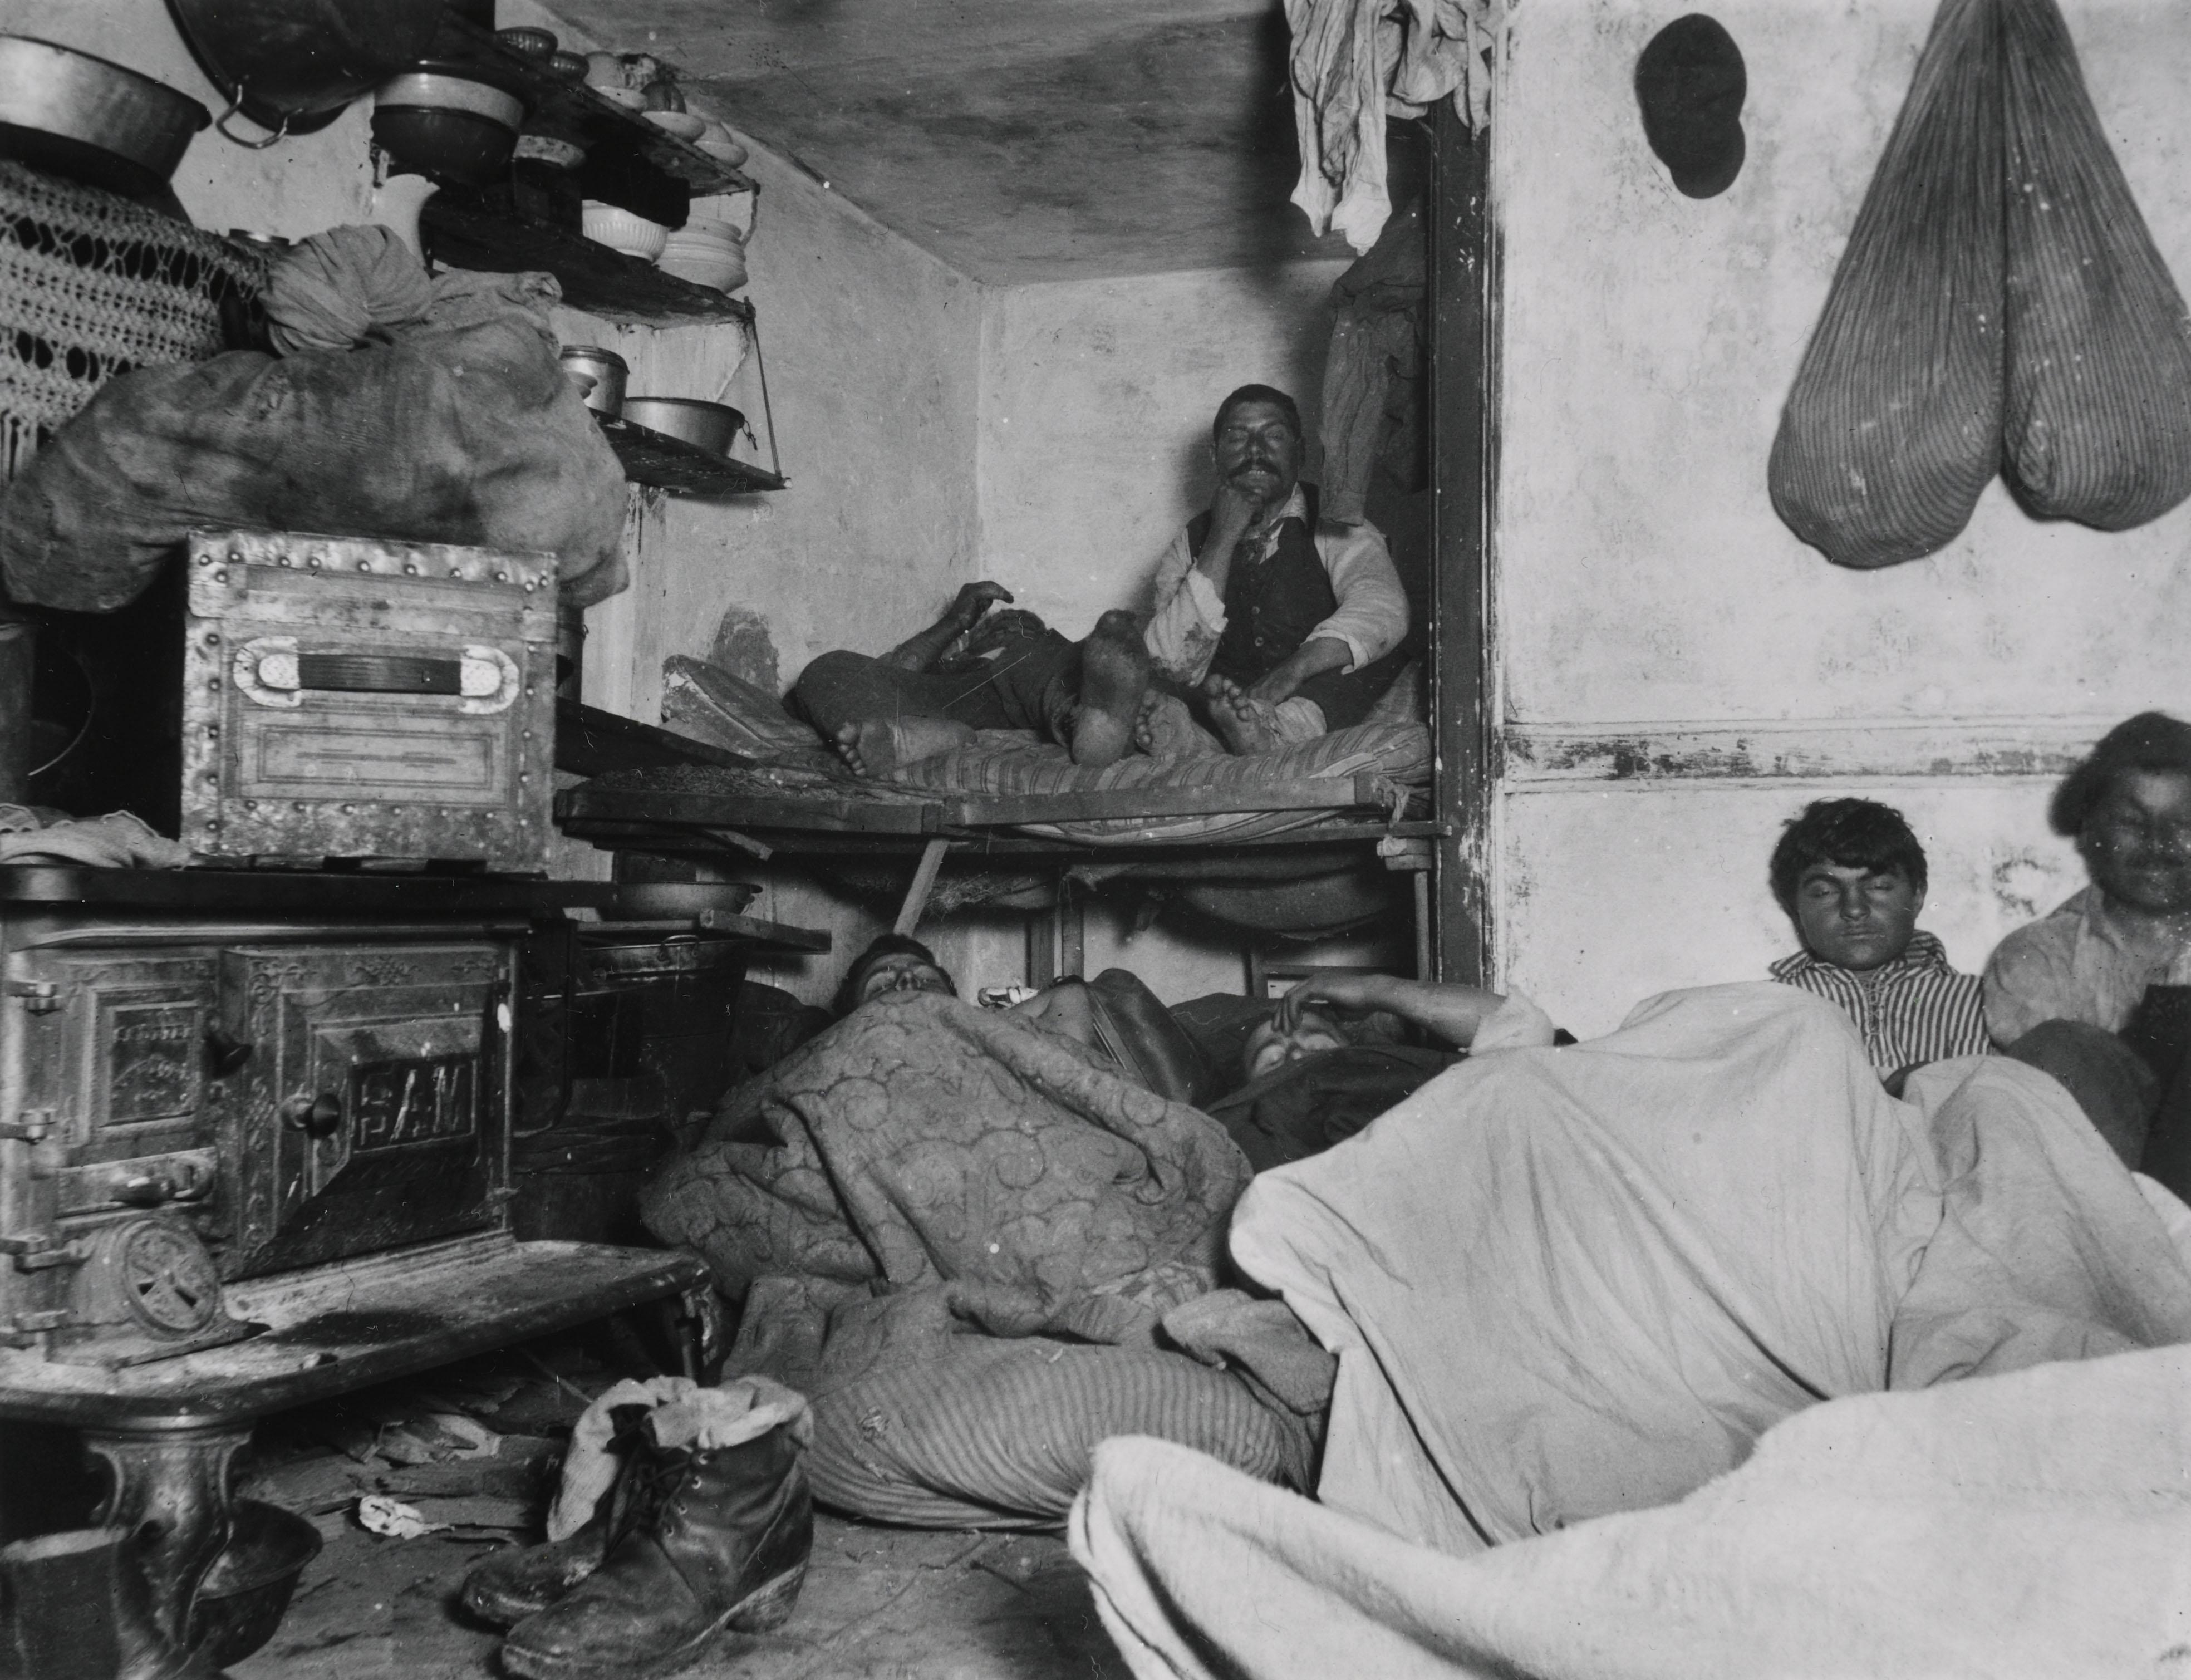 """Five Cent a Spot"" Unauthorized Lodgings in a Bayard Street Tenement. Via Preus Museum"